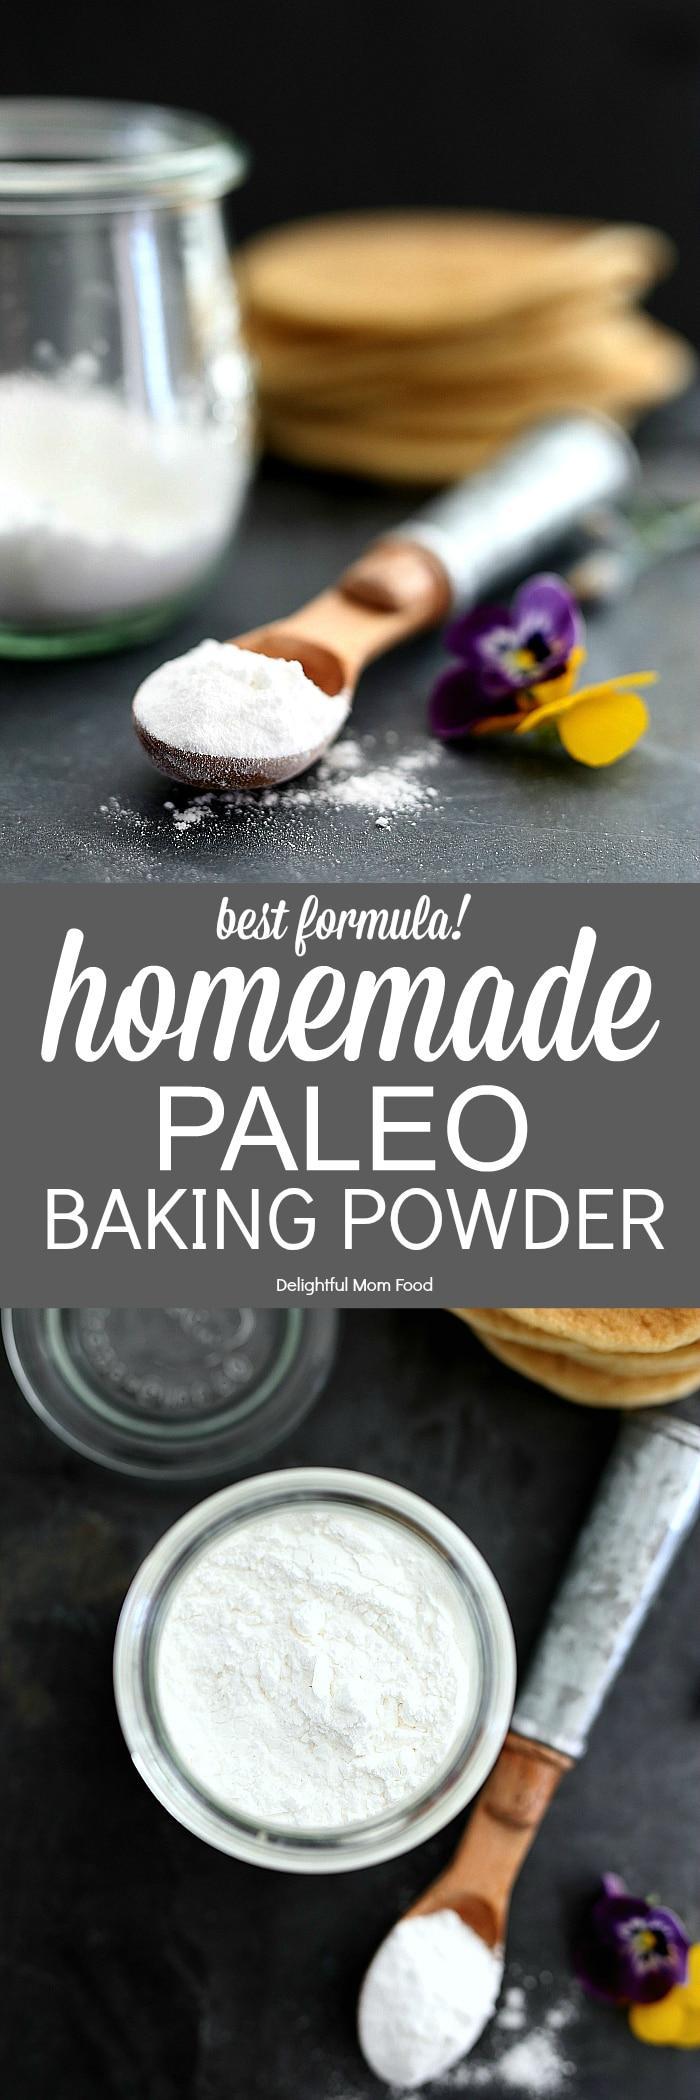 Homemade Baking Powder (Paleo) | Delightful Mom Food